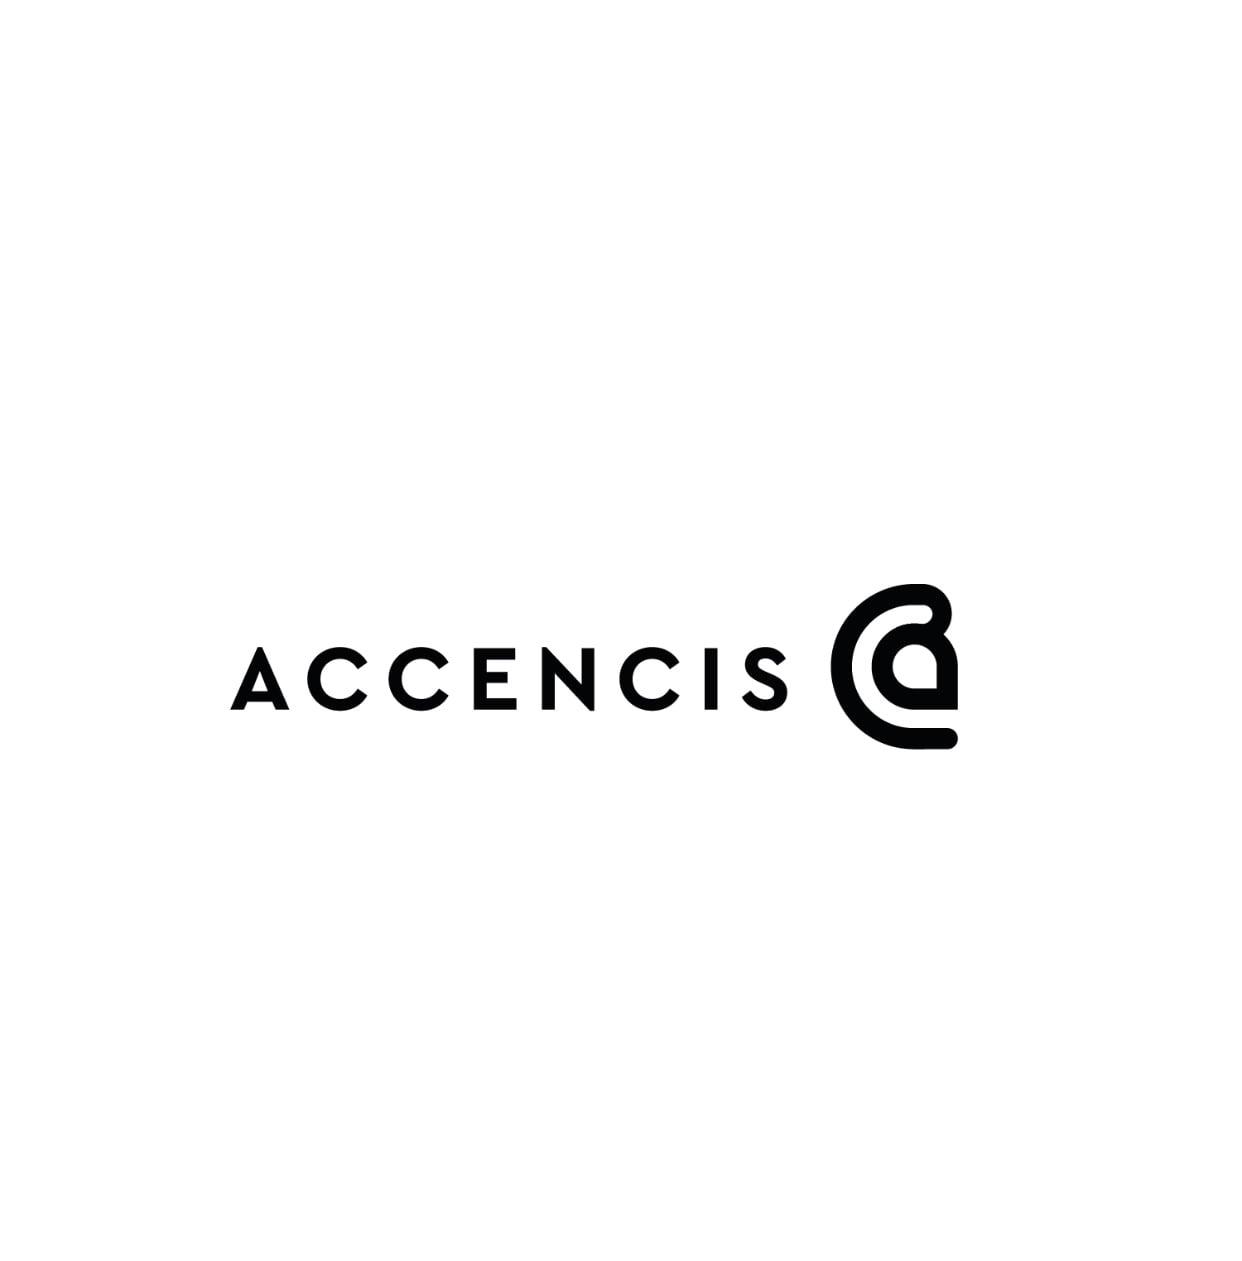 Accencis trendz Ltd